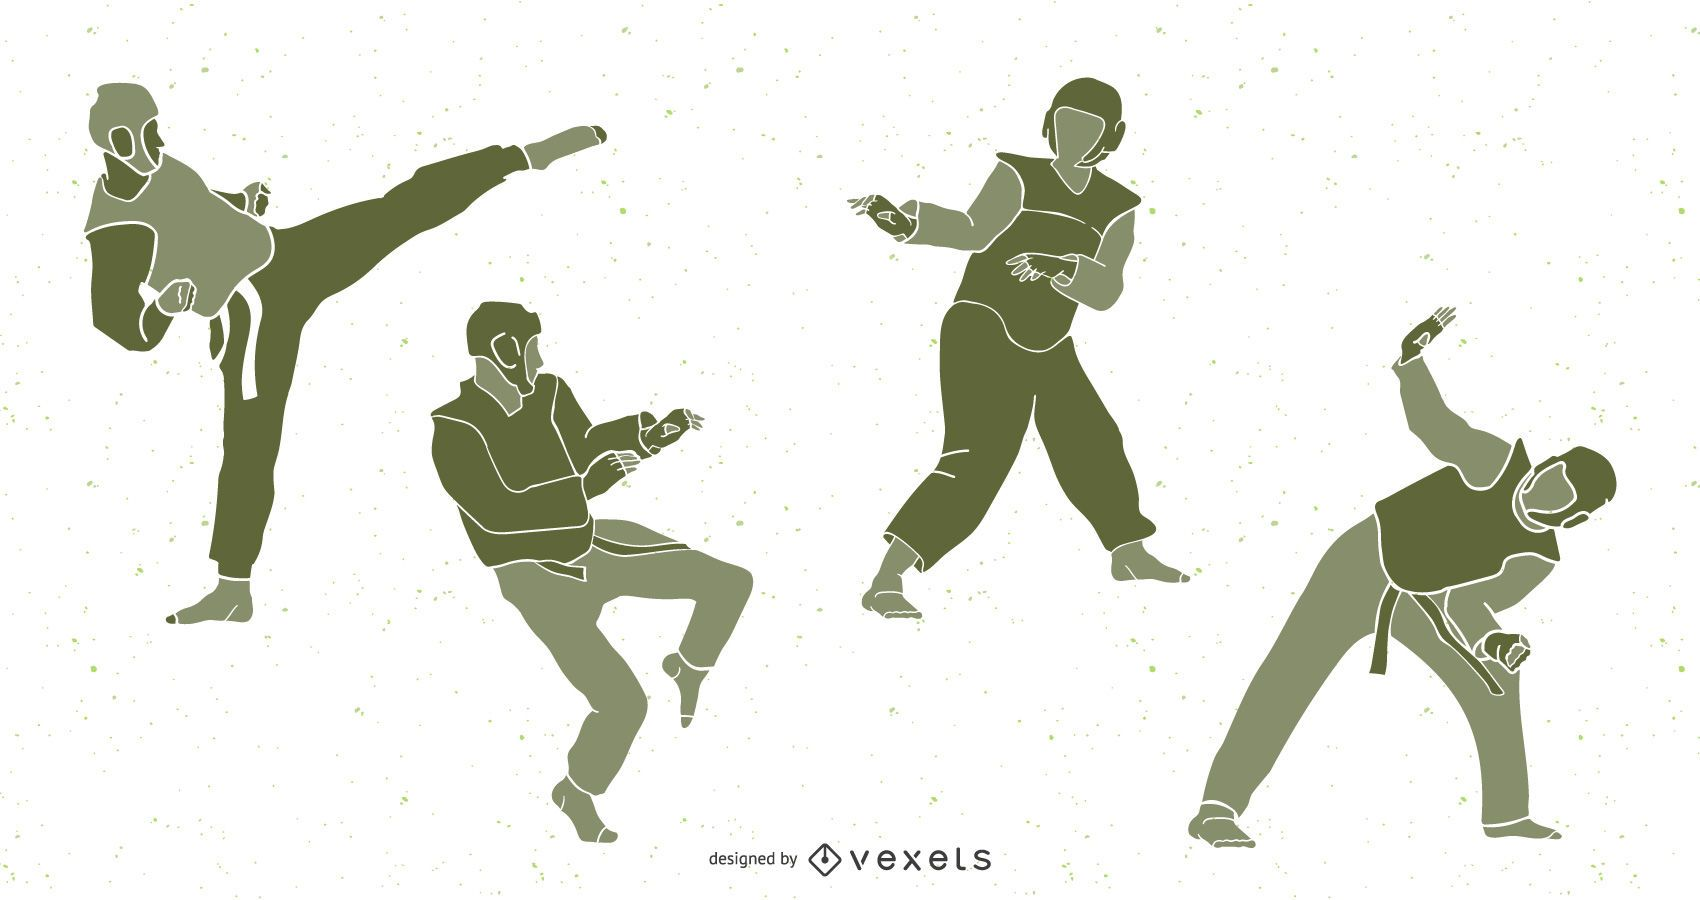 Taekwondo People Silhouette Pack